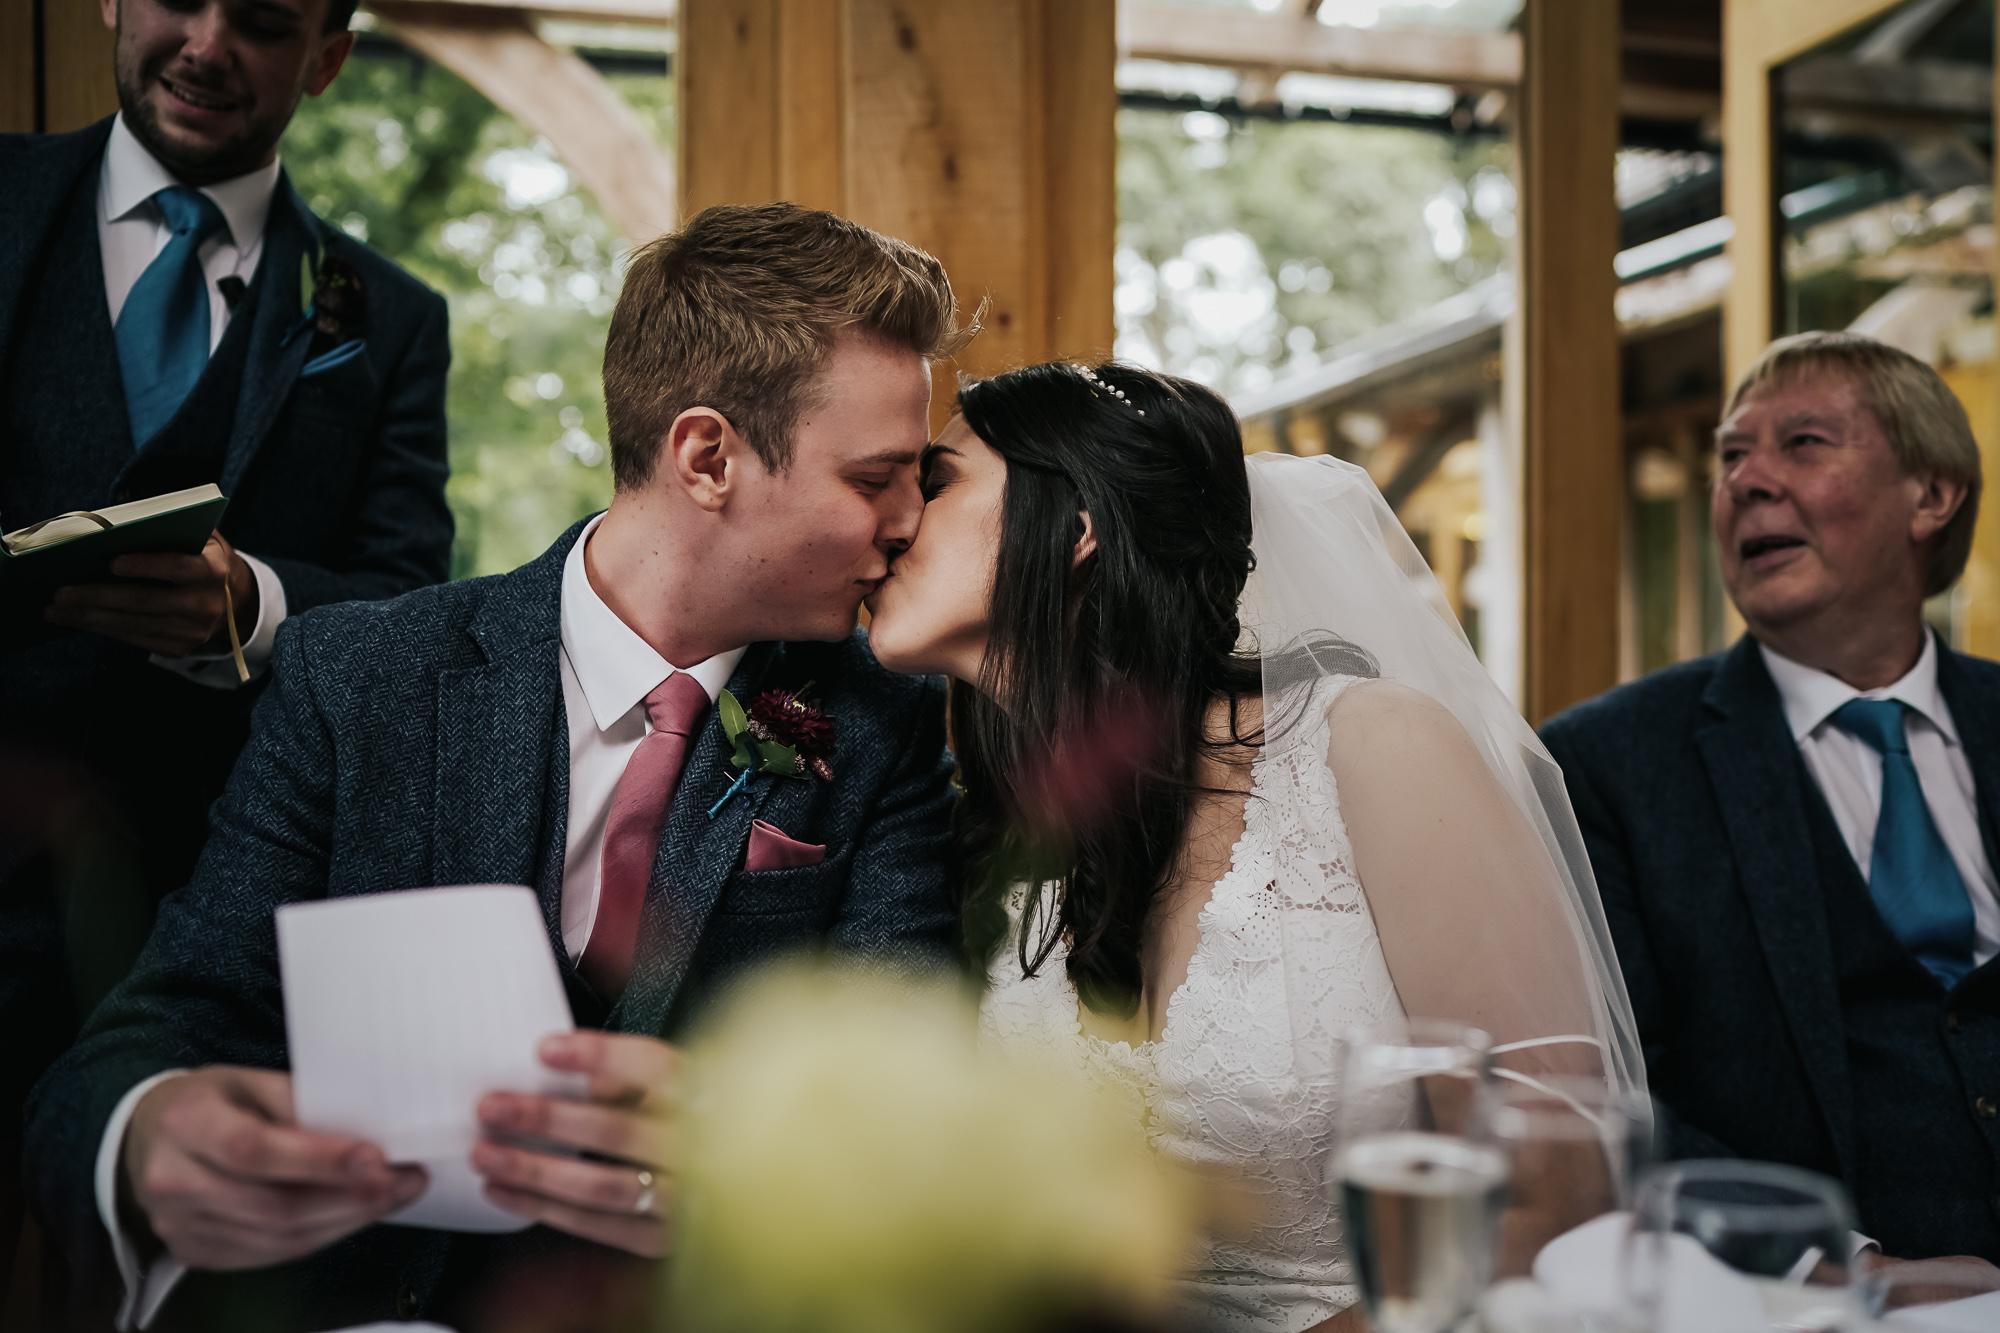 Oak tree of peover wedding photography cheshire wedding photographer (47 of 56).jpg